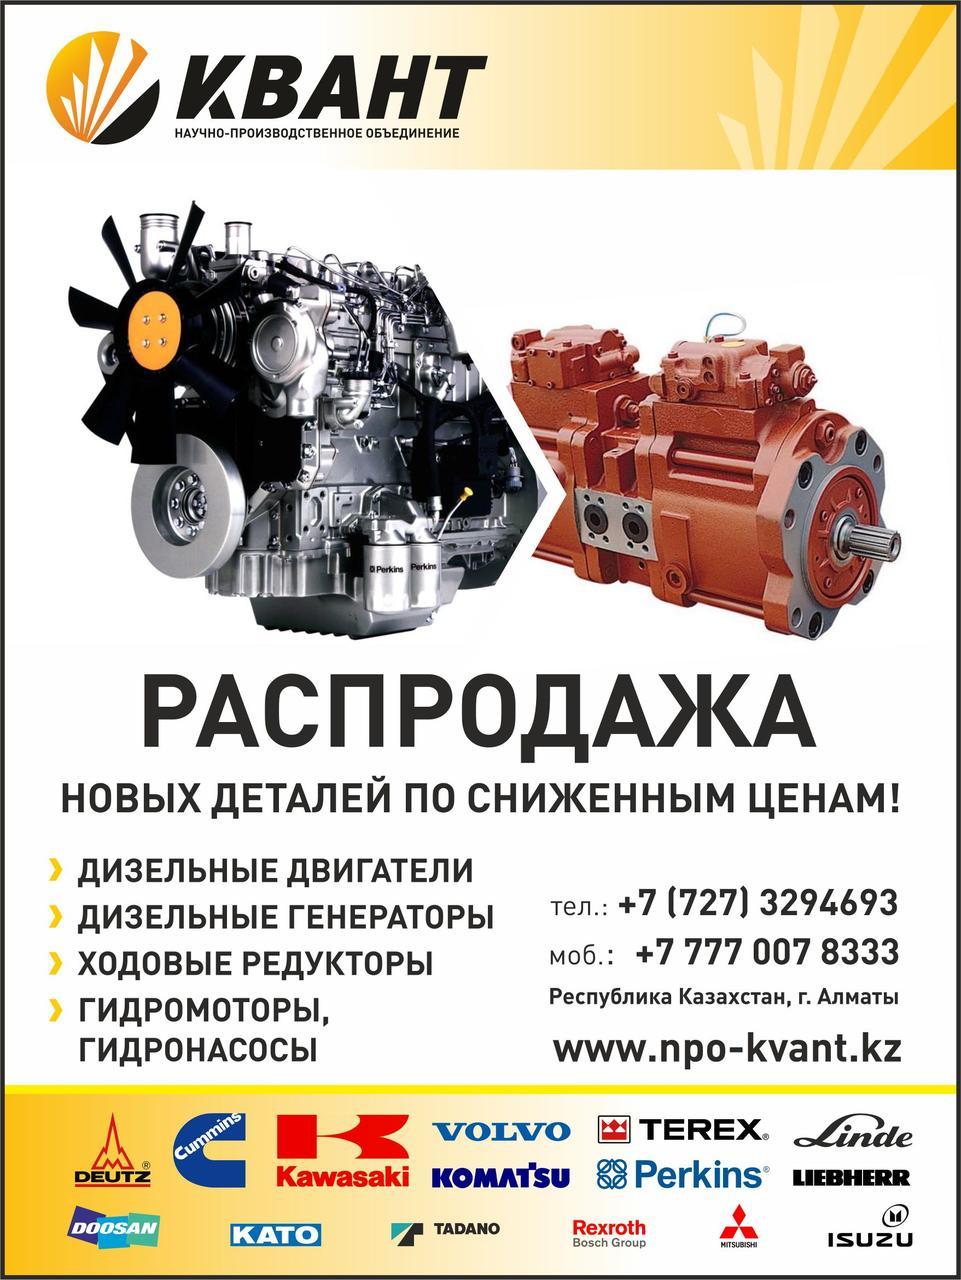 Двигатель на Komatsu HD325-6 (4WD), HD325-6, HD405-6, PC750/LC/SE-6, PC800/SE-6, PC1800-6, HM350-1, HM400-1